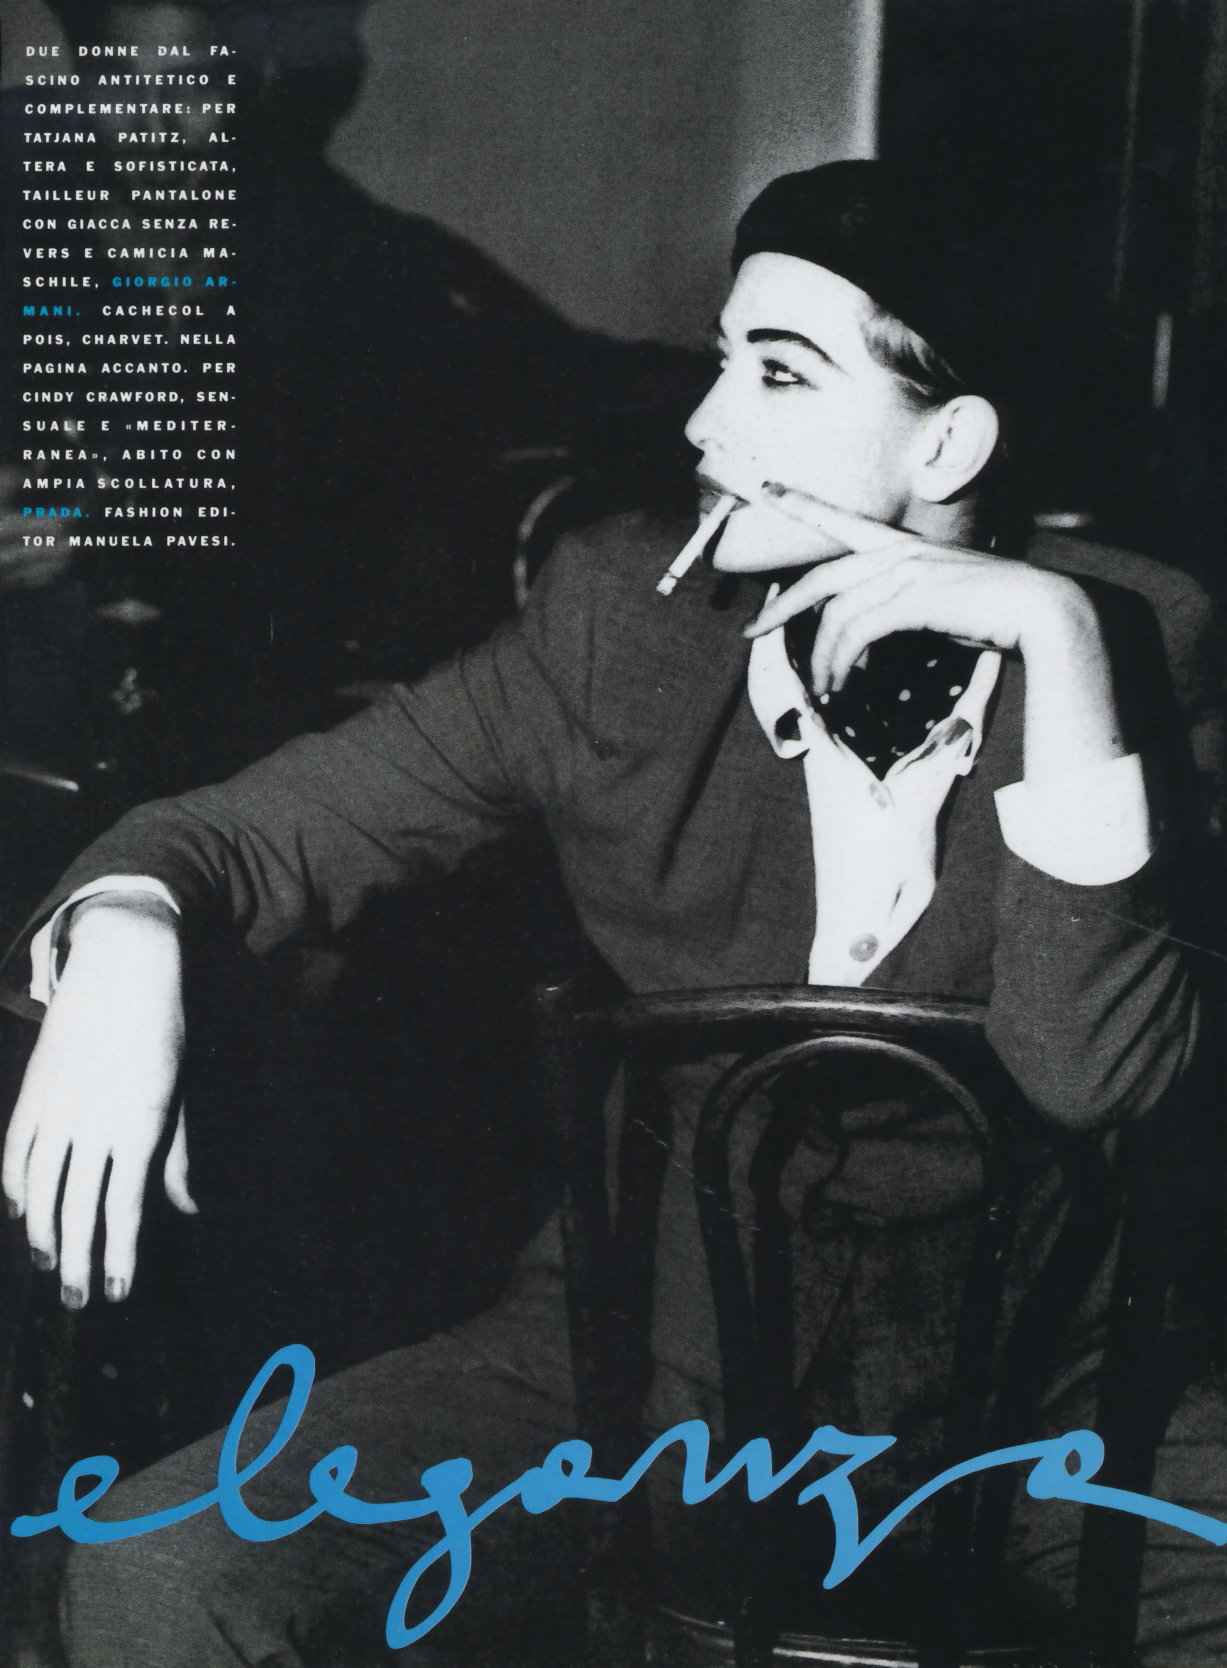 Vogue (Italia) January 1991 | Cindy Crawford & Tatjana Patitz 02.jpg